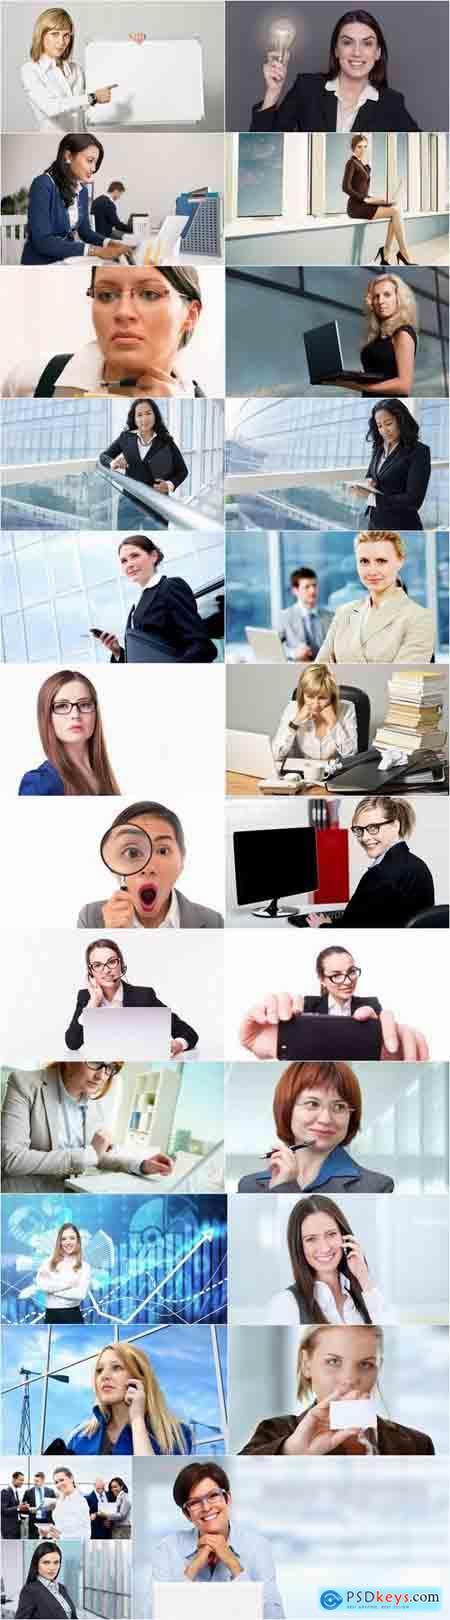 Business woman female girl business suit laptop 25 HQ Jpeg